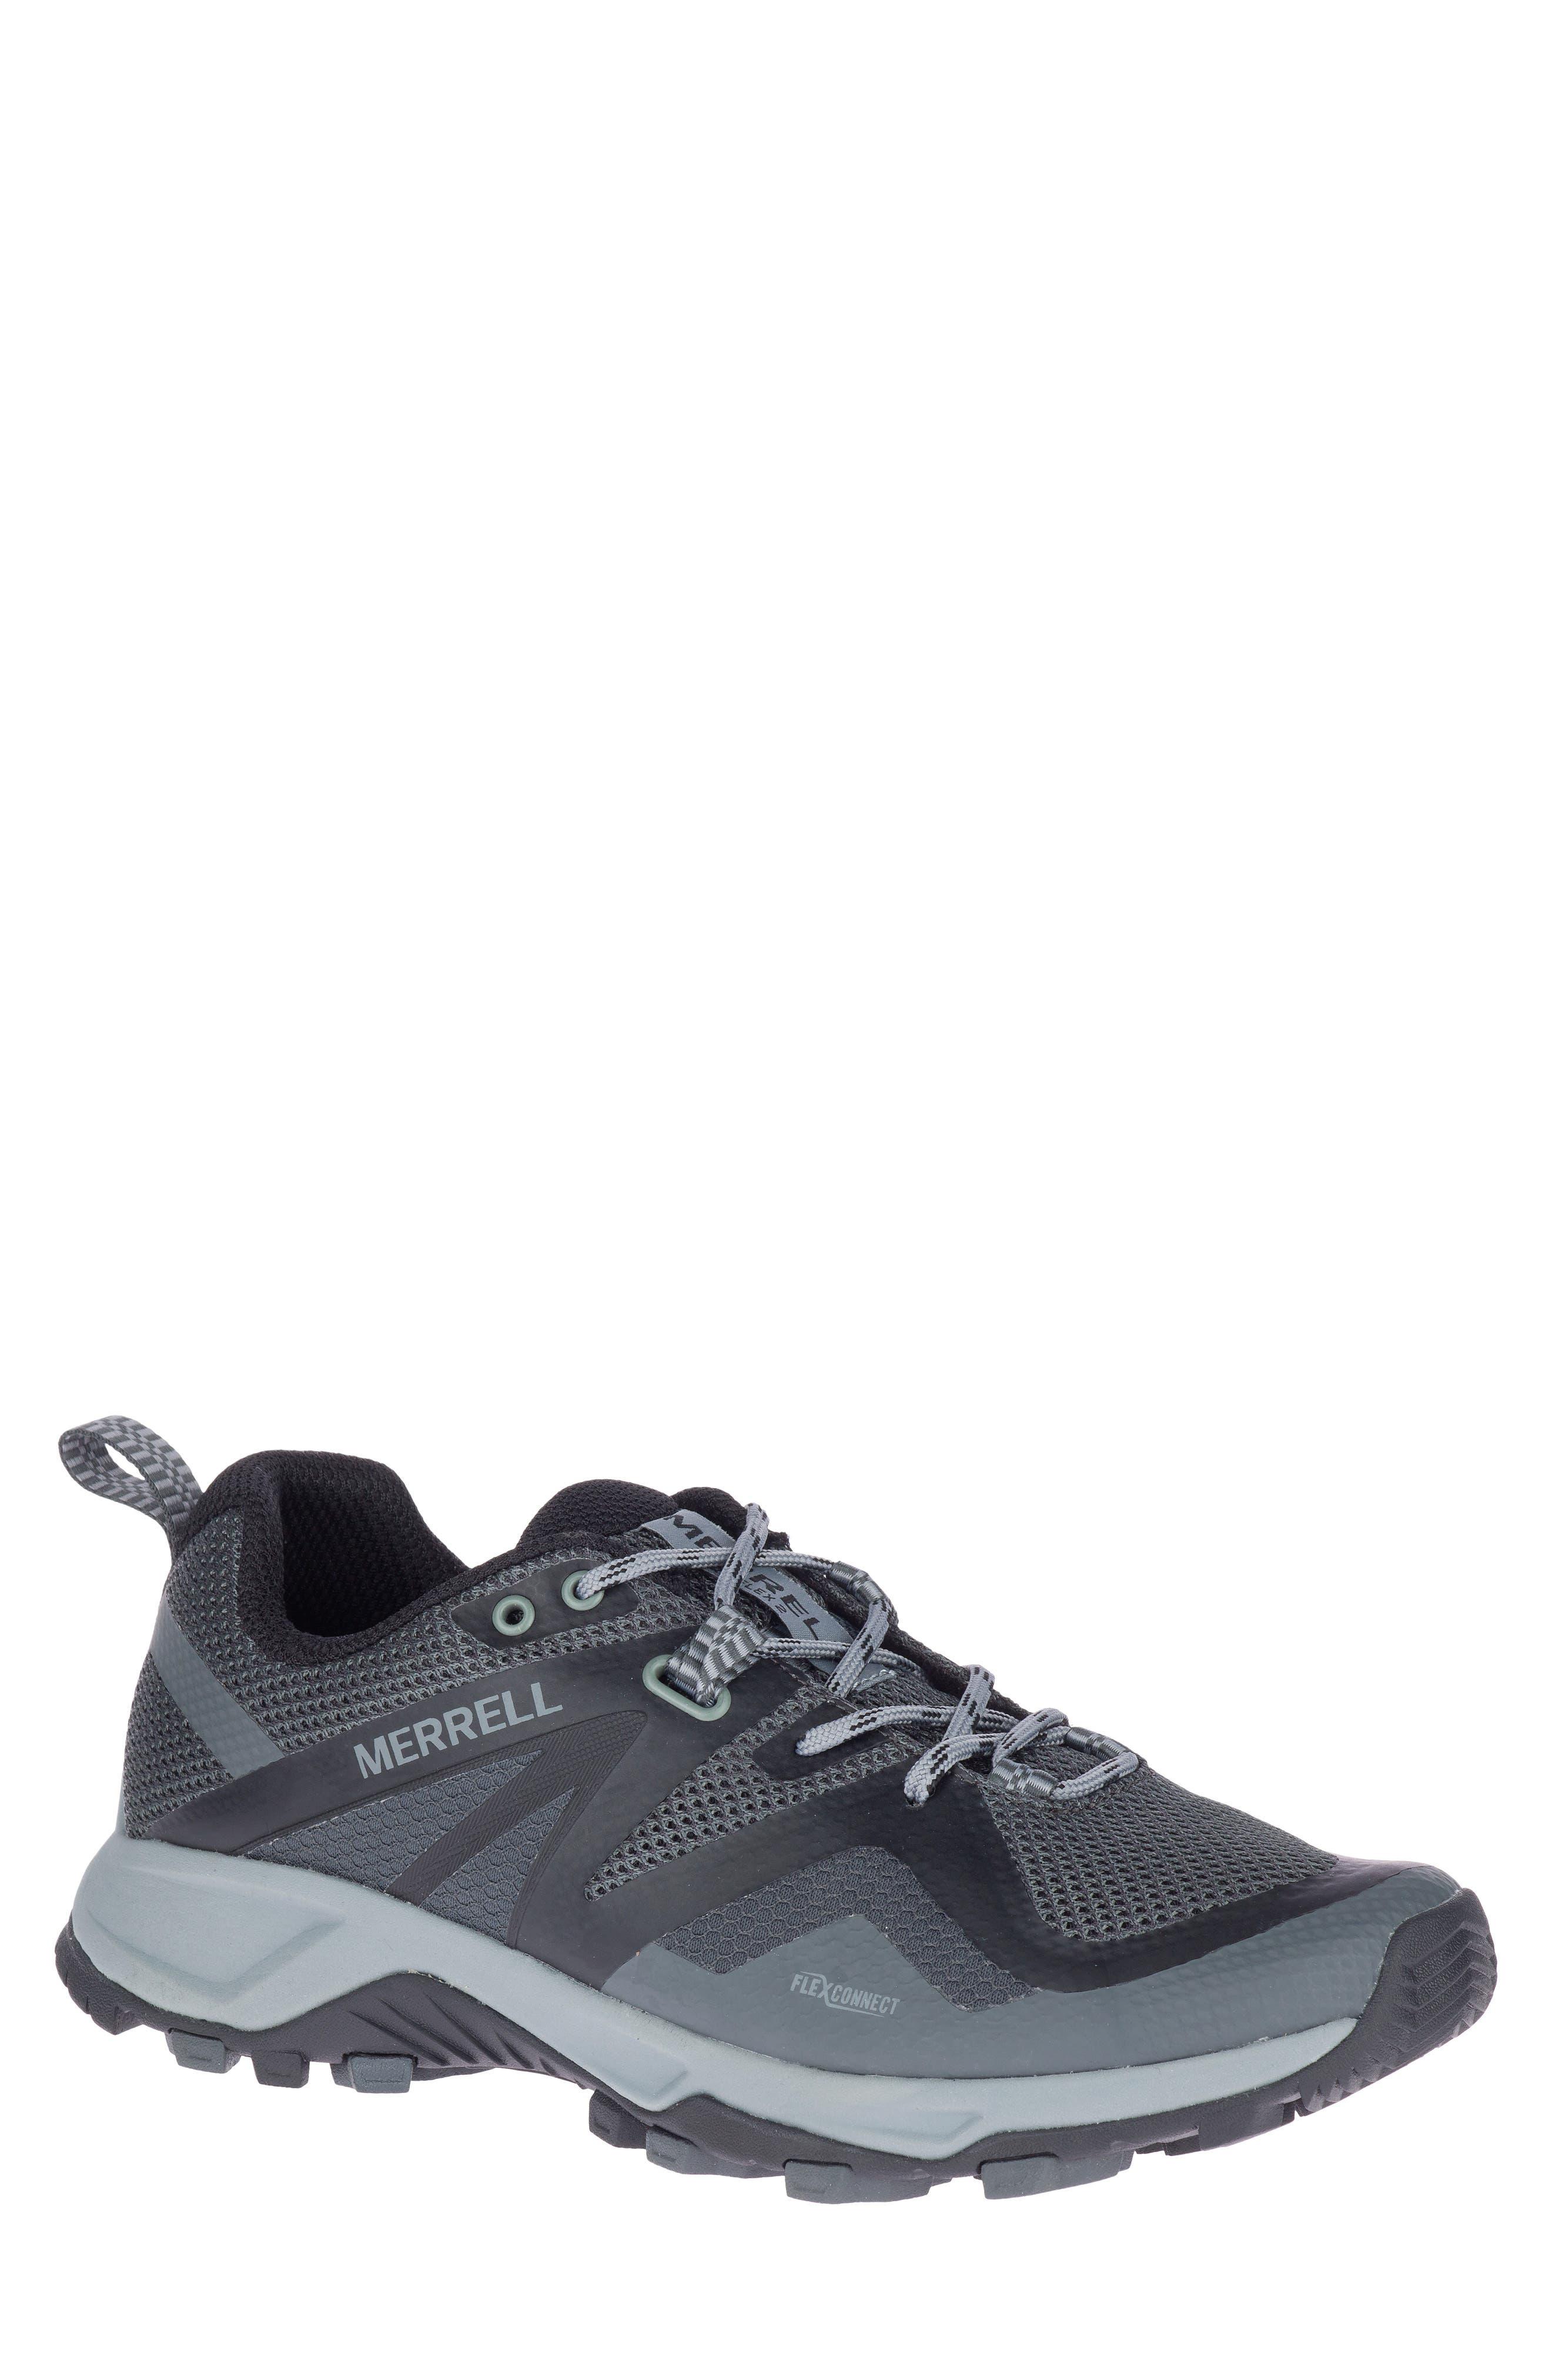 Mqm Flex 2 Trail Running Shoe